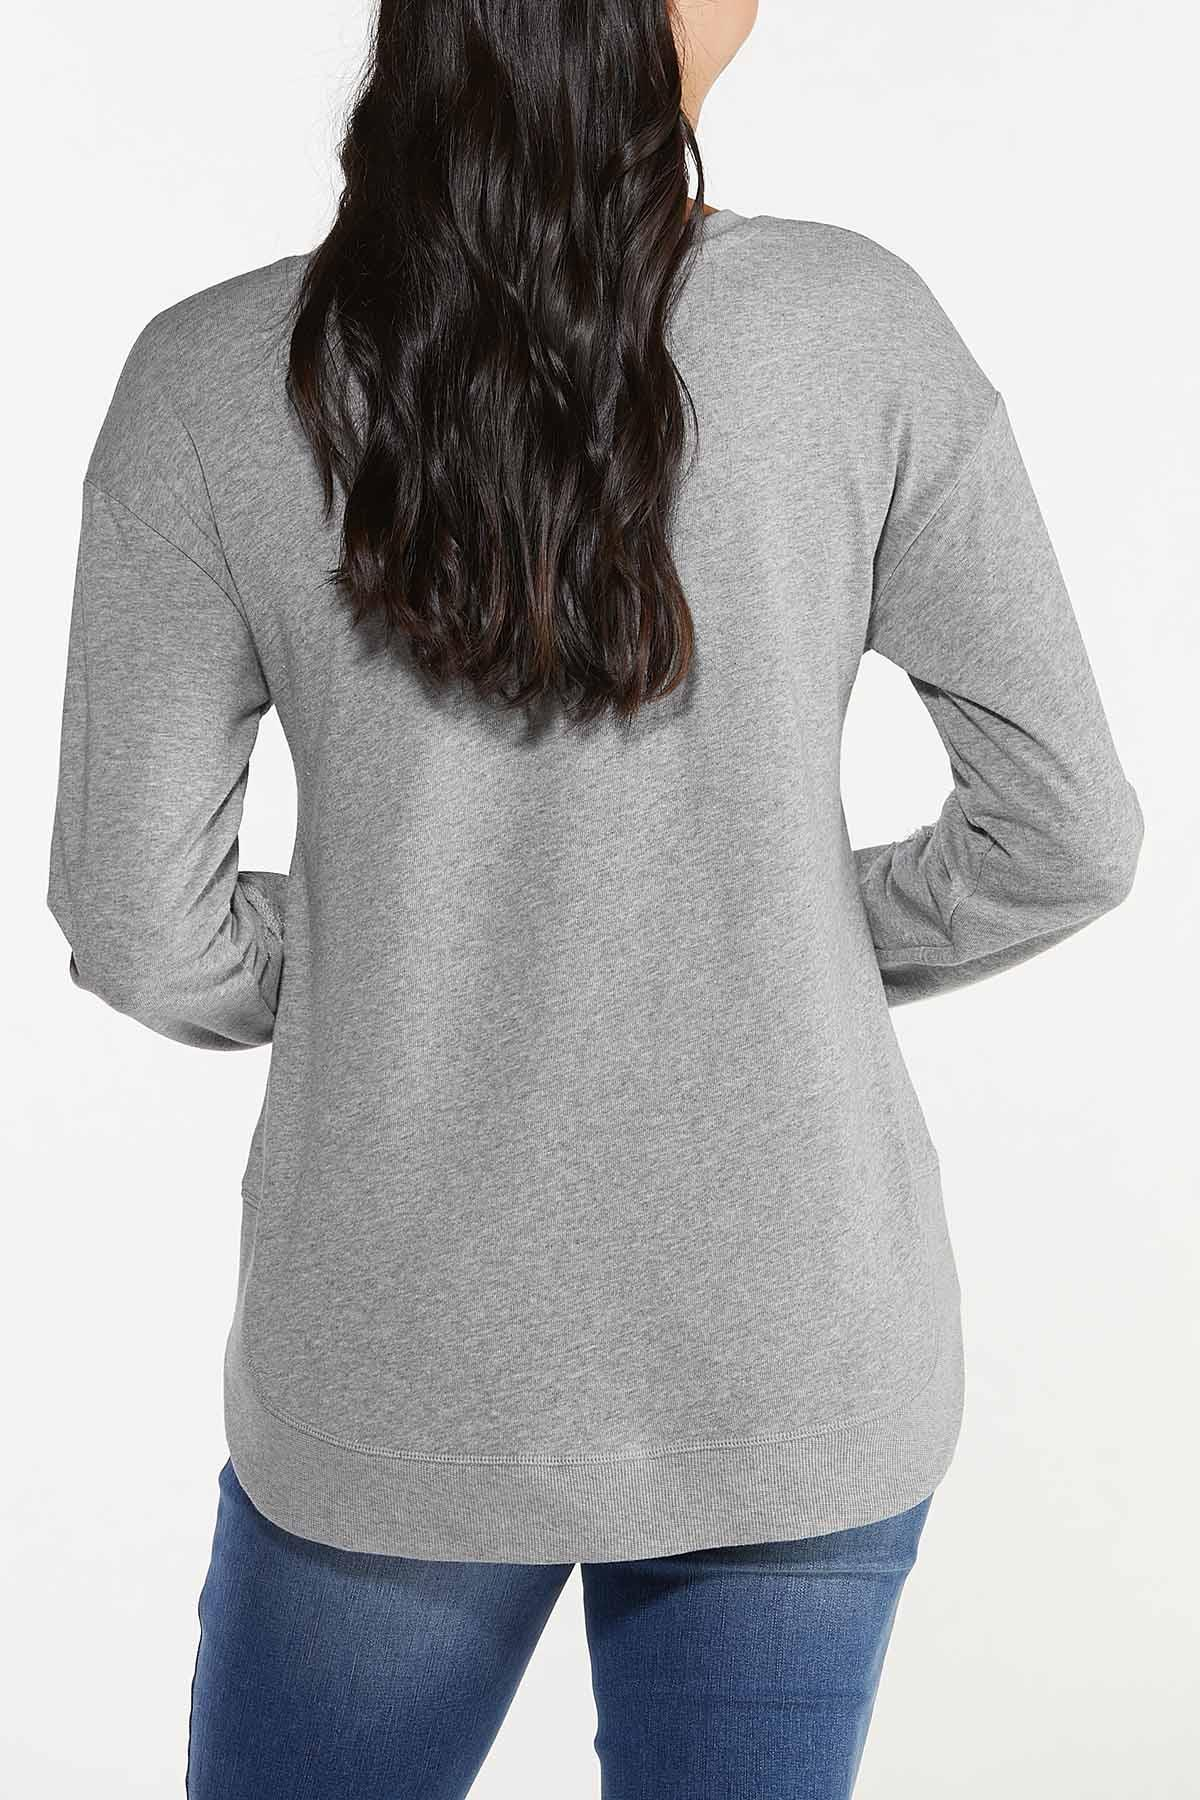 Gray Distressed Sweatshirt (Item #44682016)